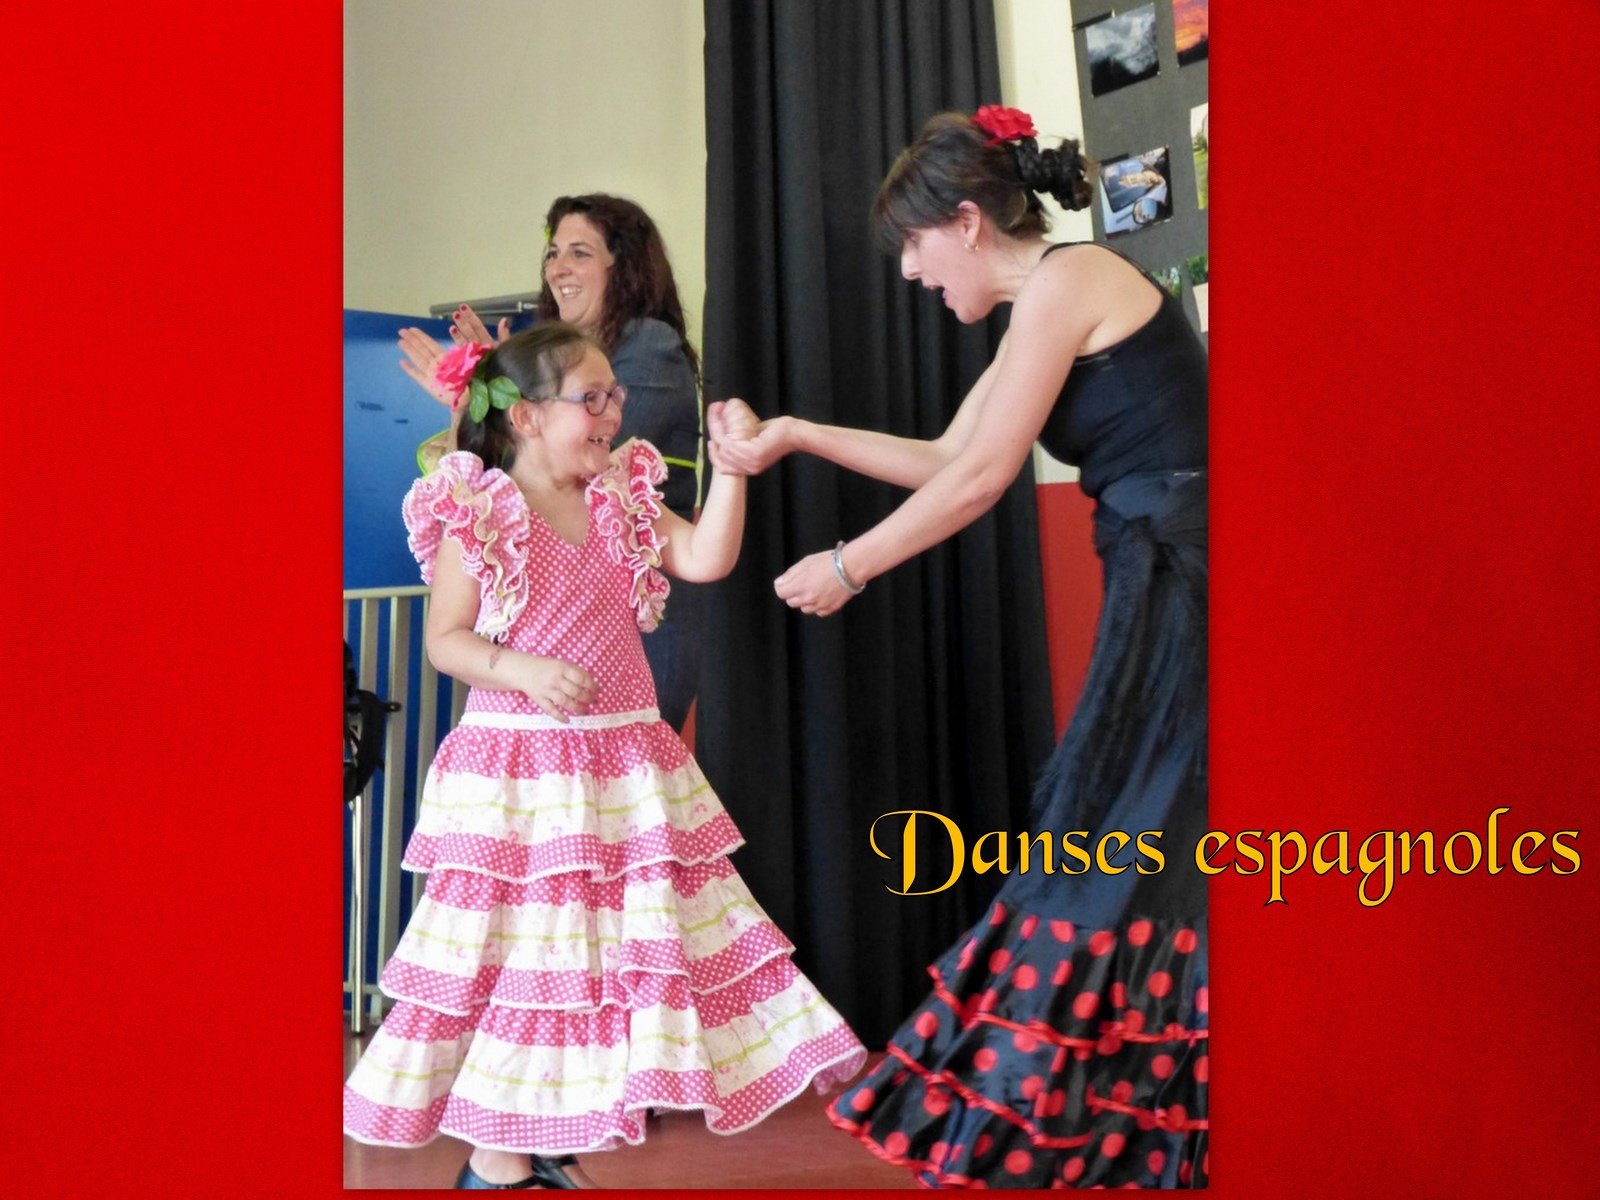 Danses espagnoles